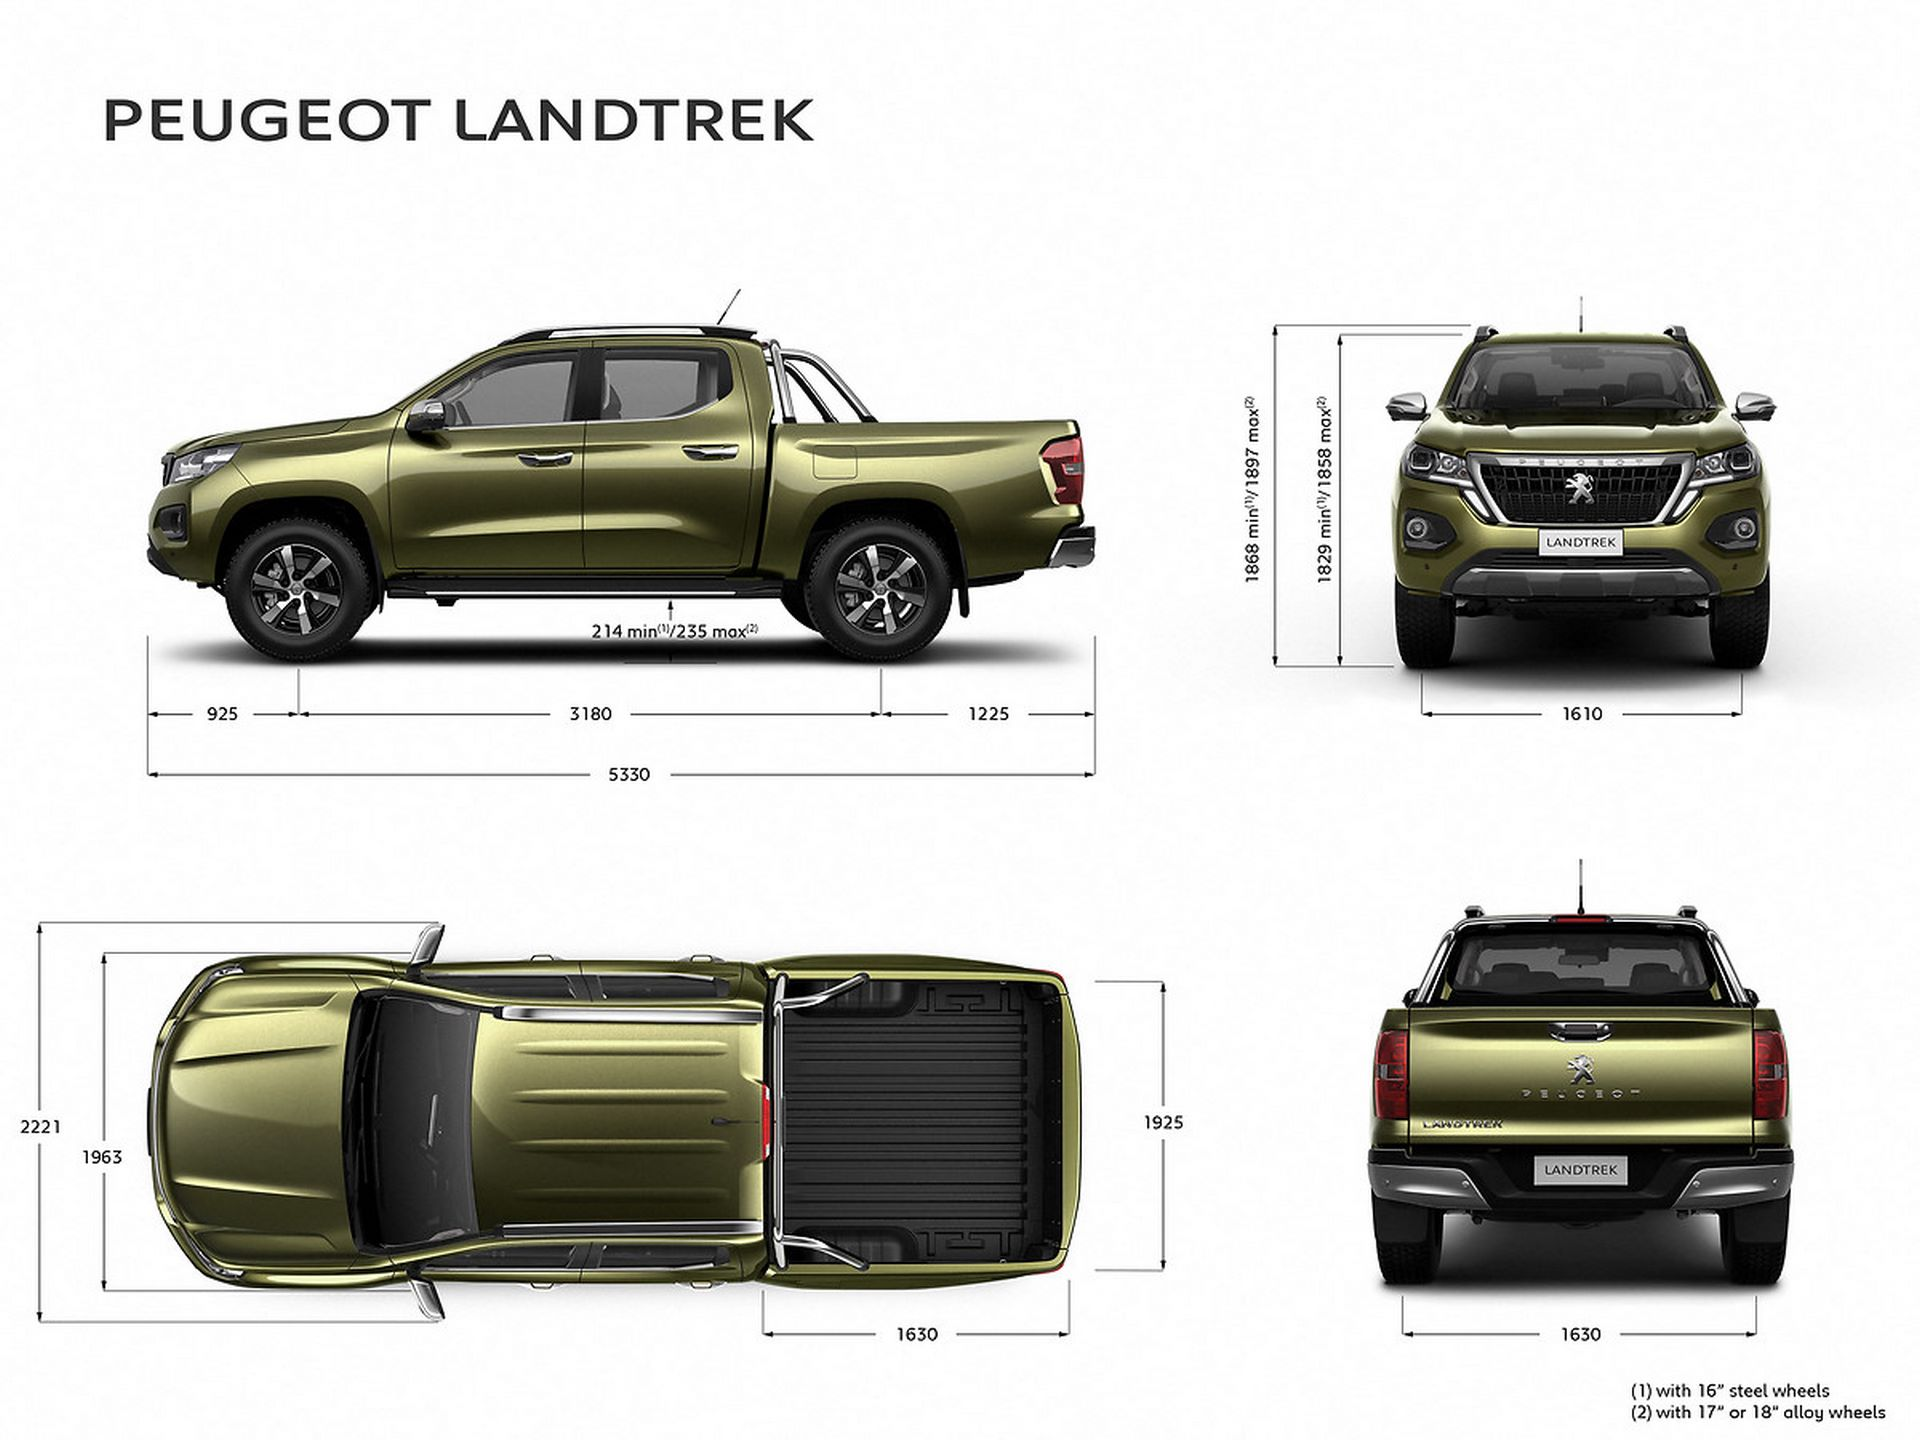 Peugeot-Landtrek-38